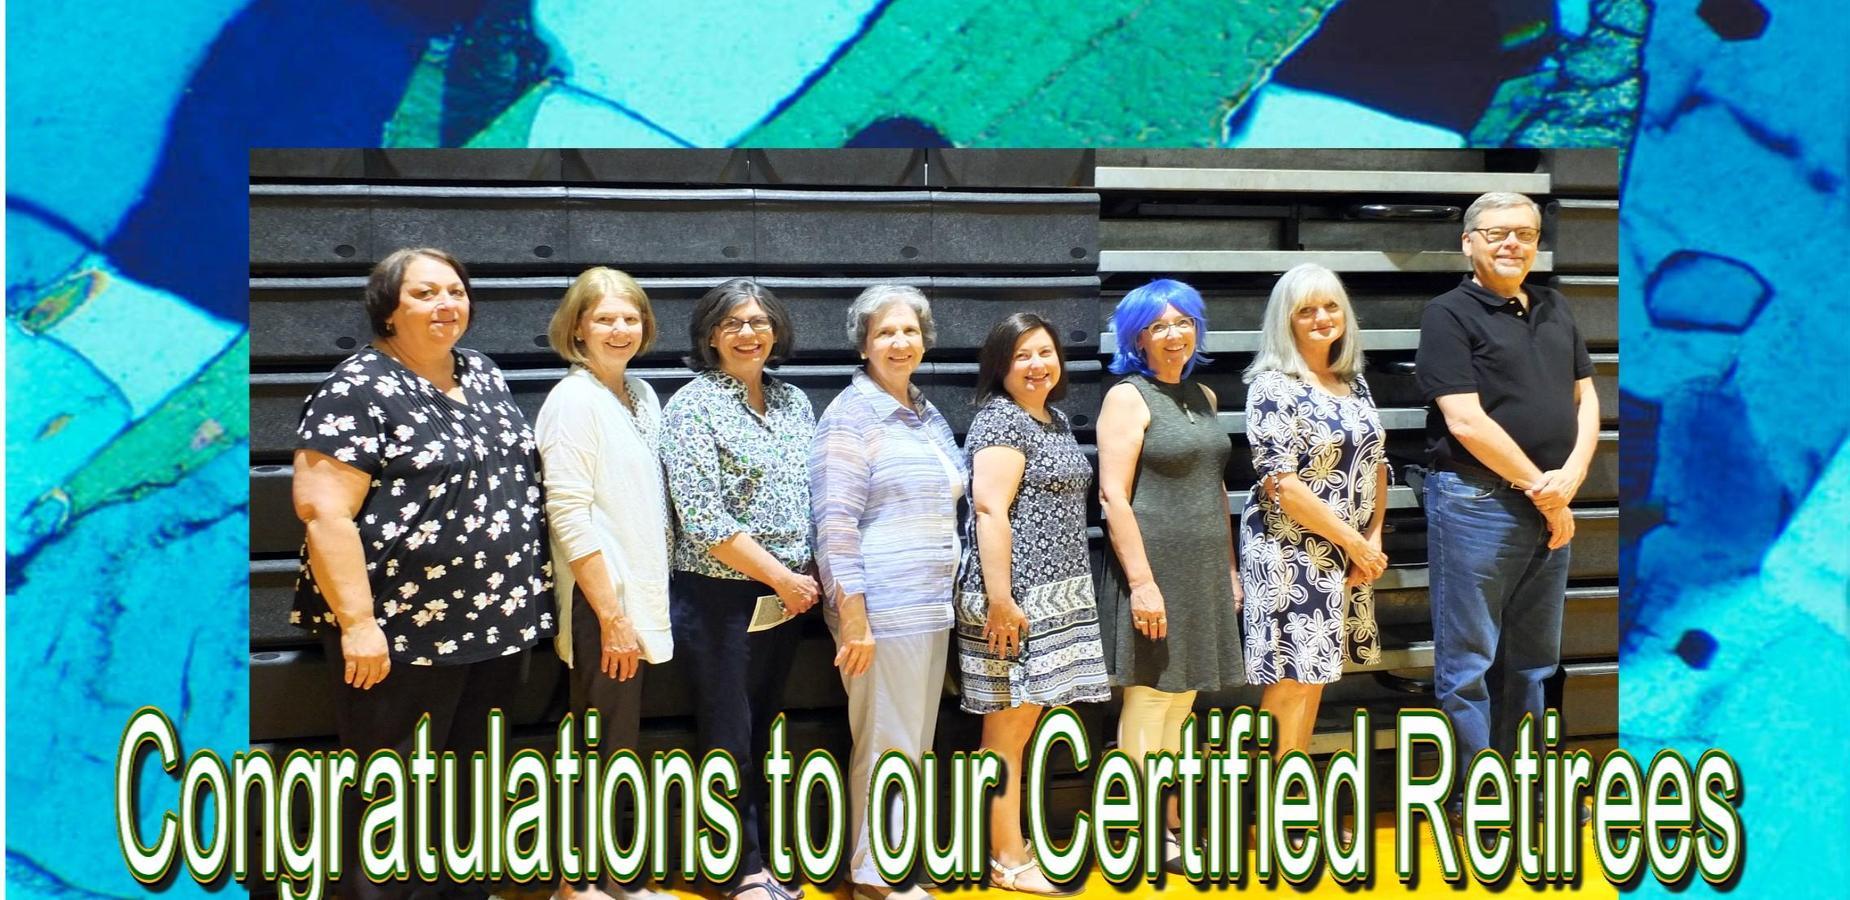 Certified Retirees